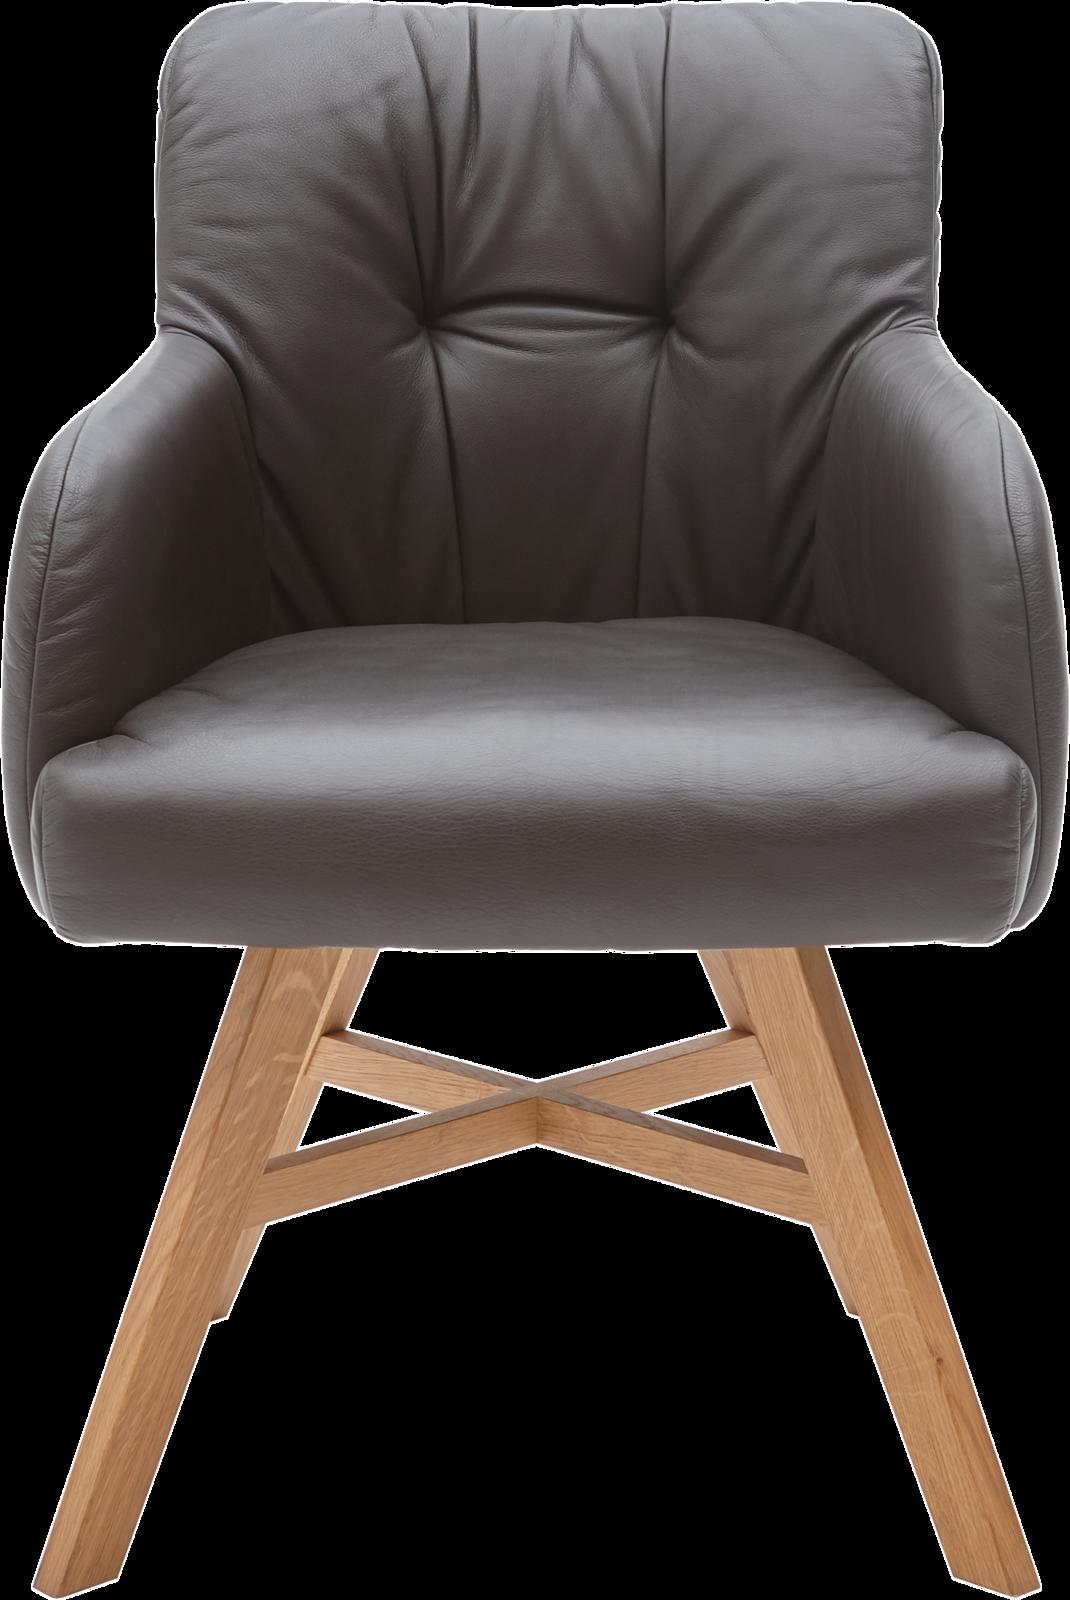 Sessel Clint in dunkelbraunem Leder und Holzfüßen.